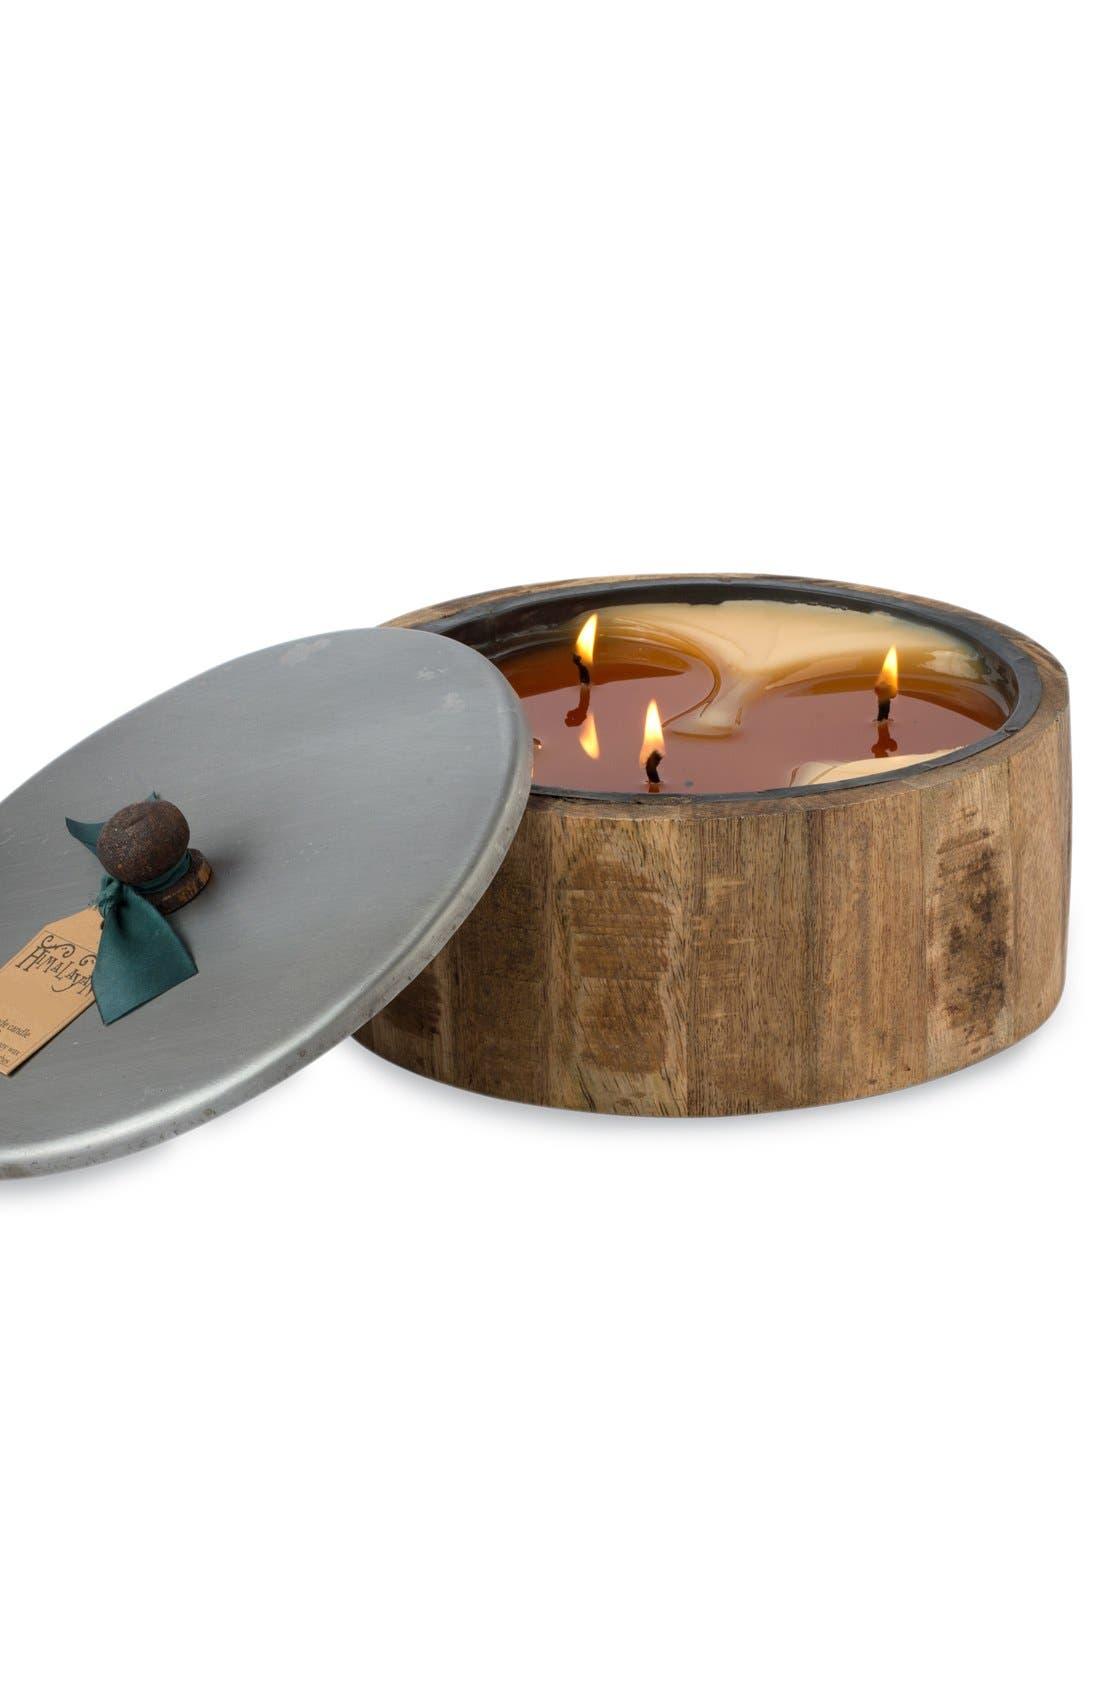 Main Image - Himalayan Trading Post 'Wooden Barrel' Candle